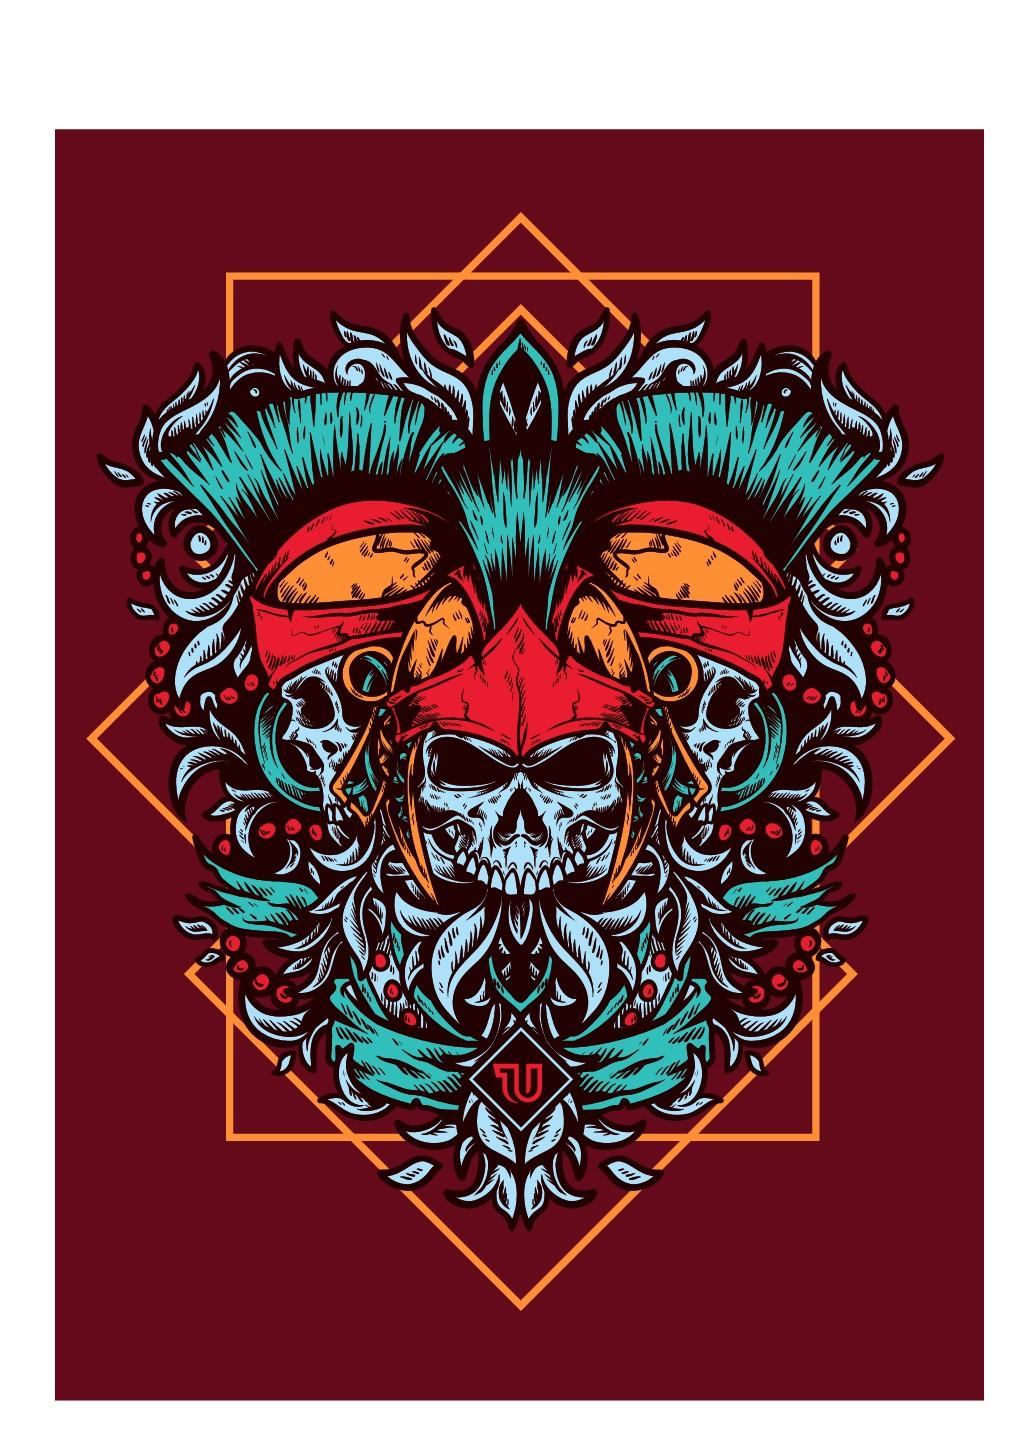 T-shirt Illustration for Urmou Clothing